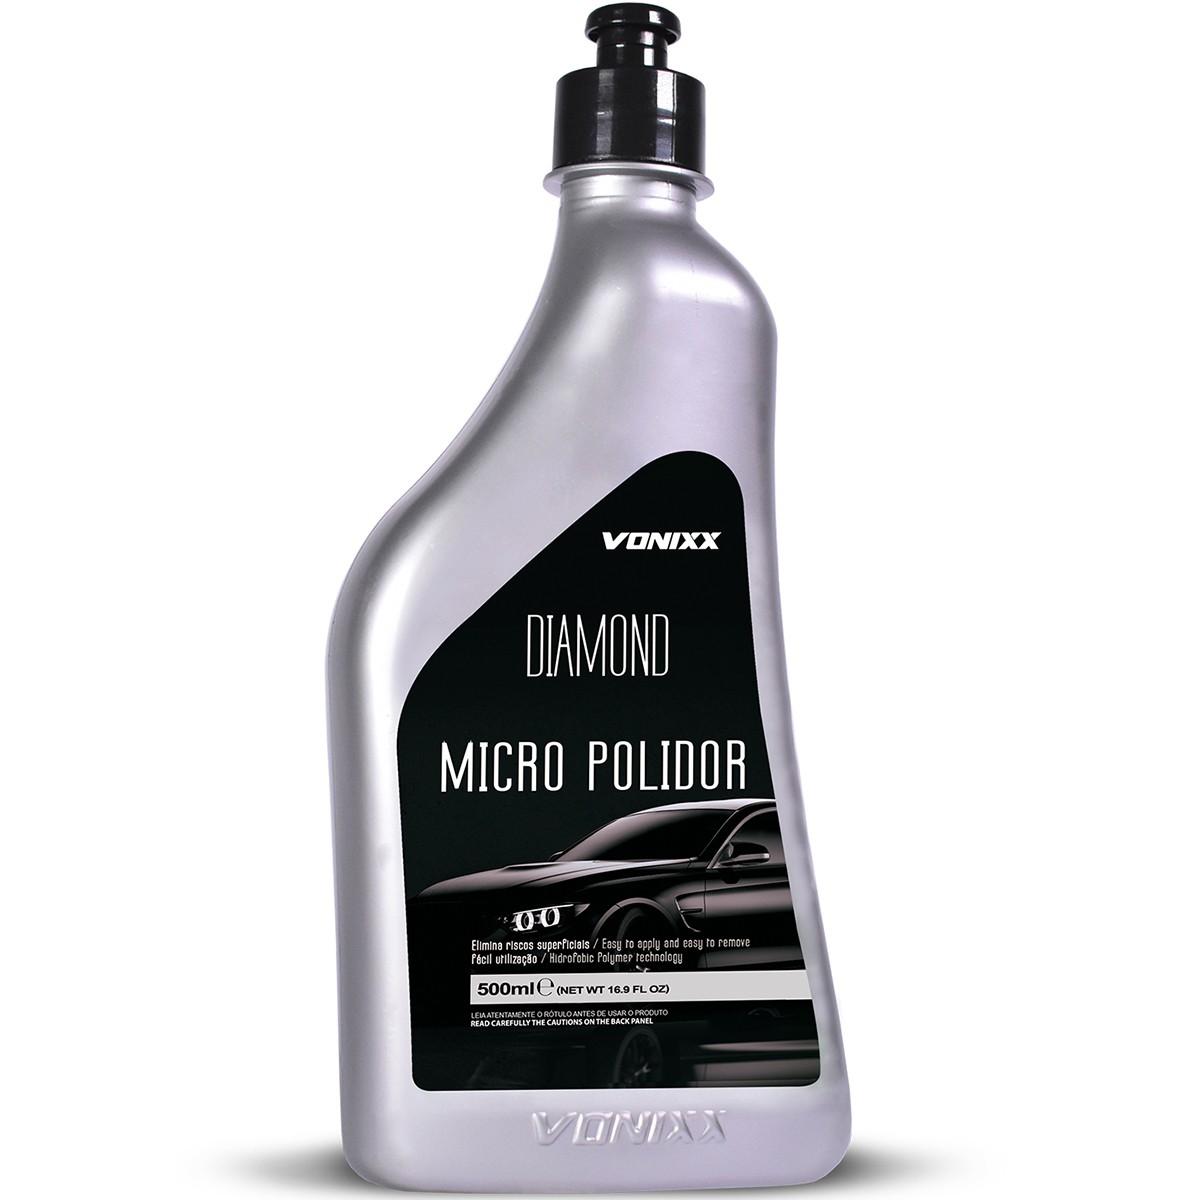 VONIXX MICRO POLIDOR 500ML